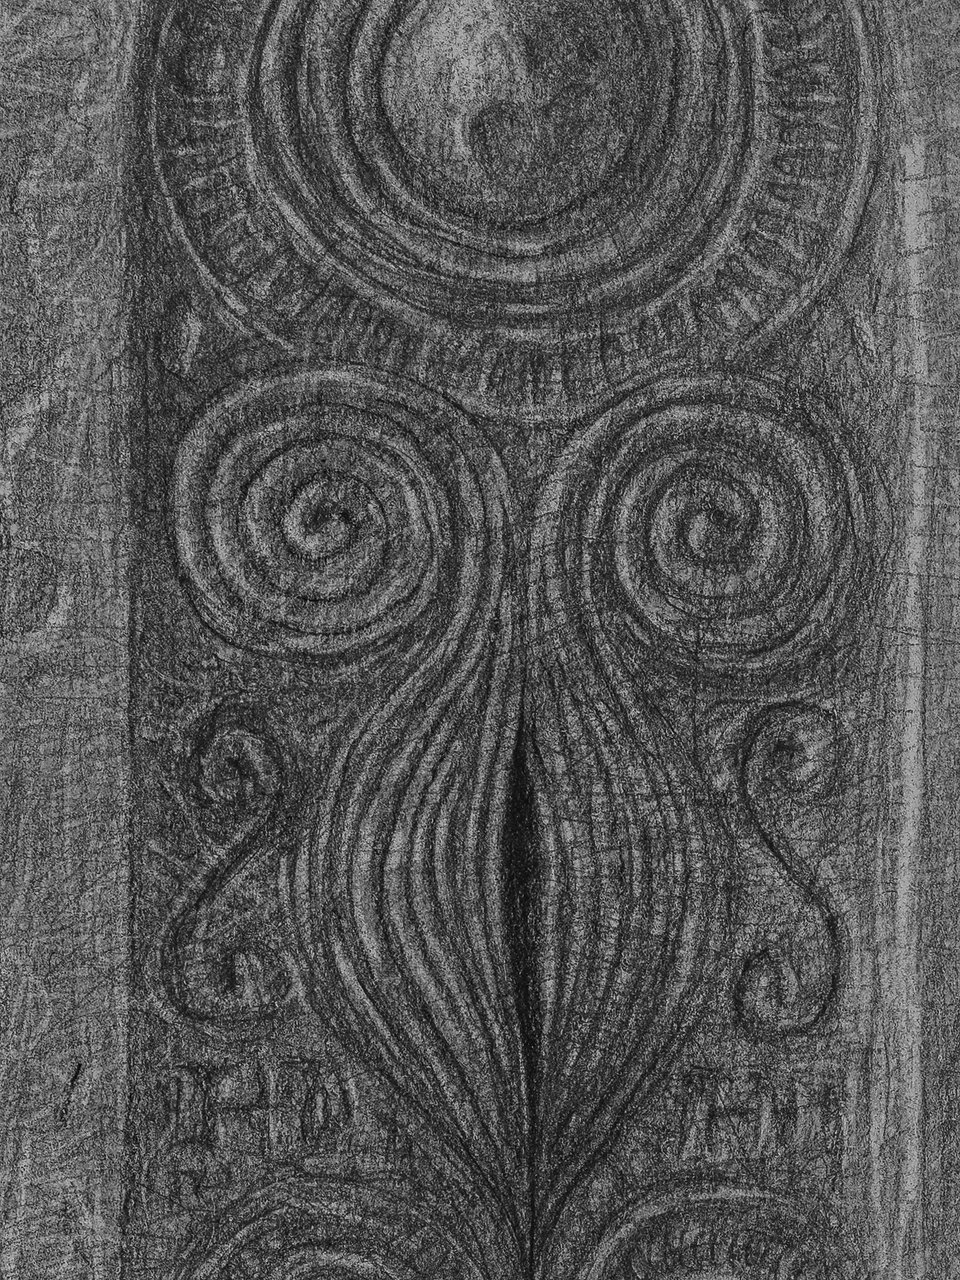 Ancient Monolith d2.jpg